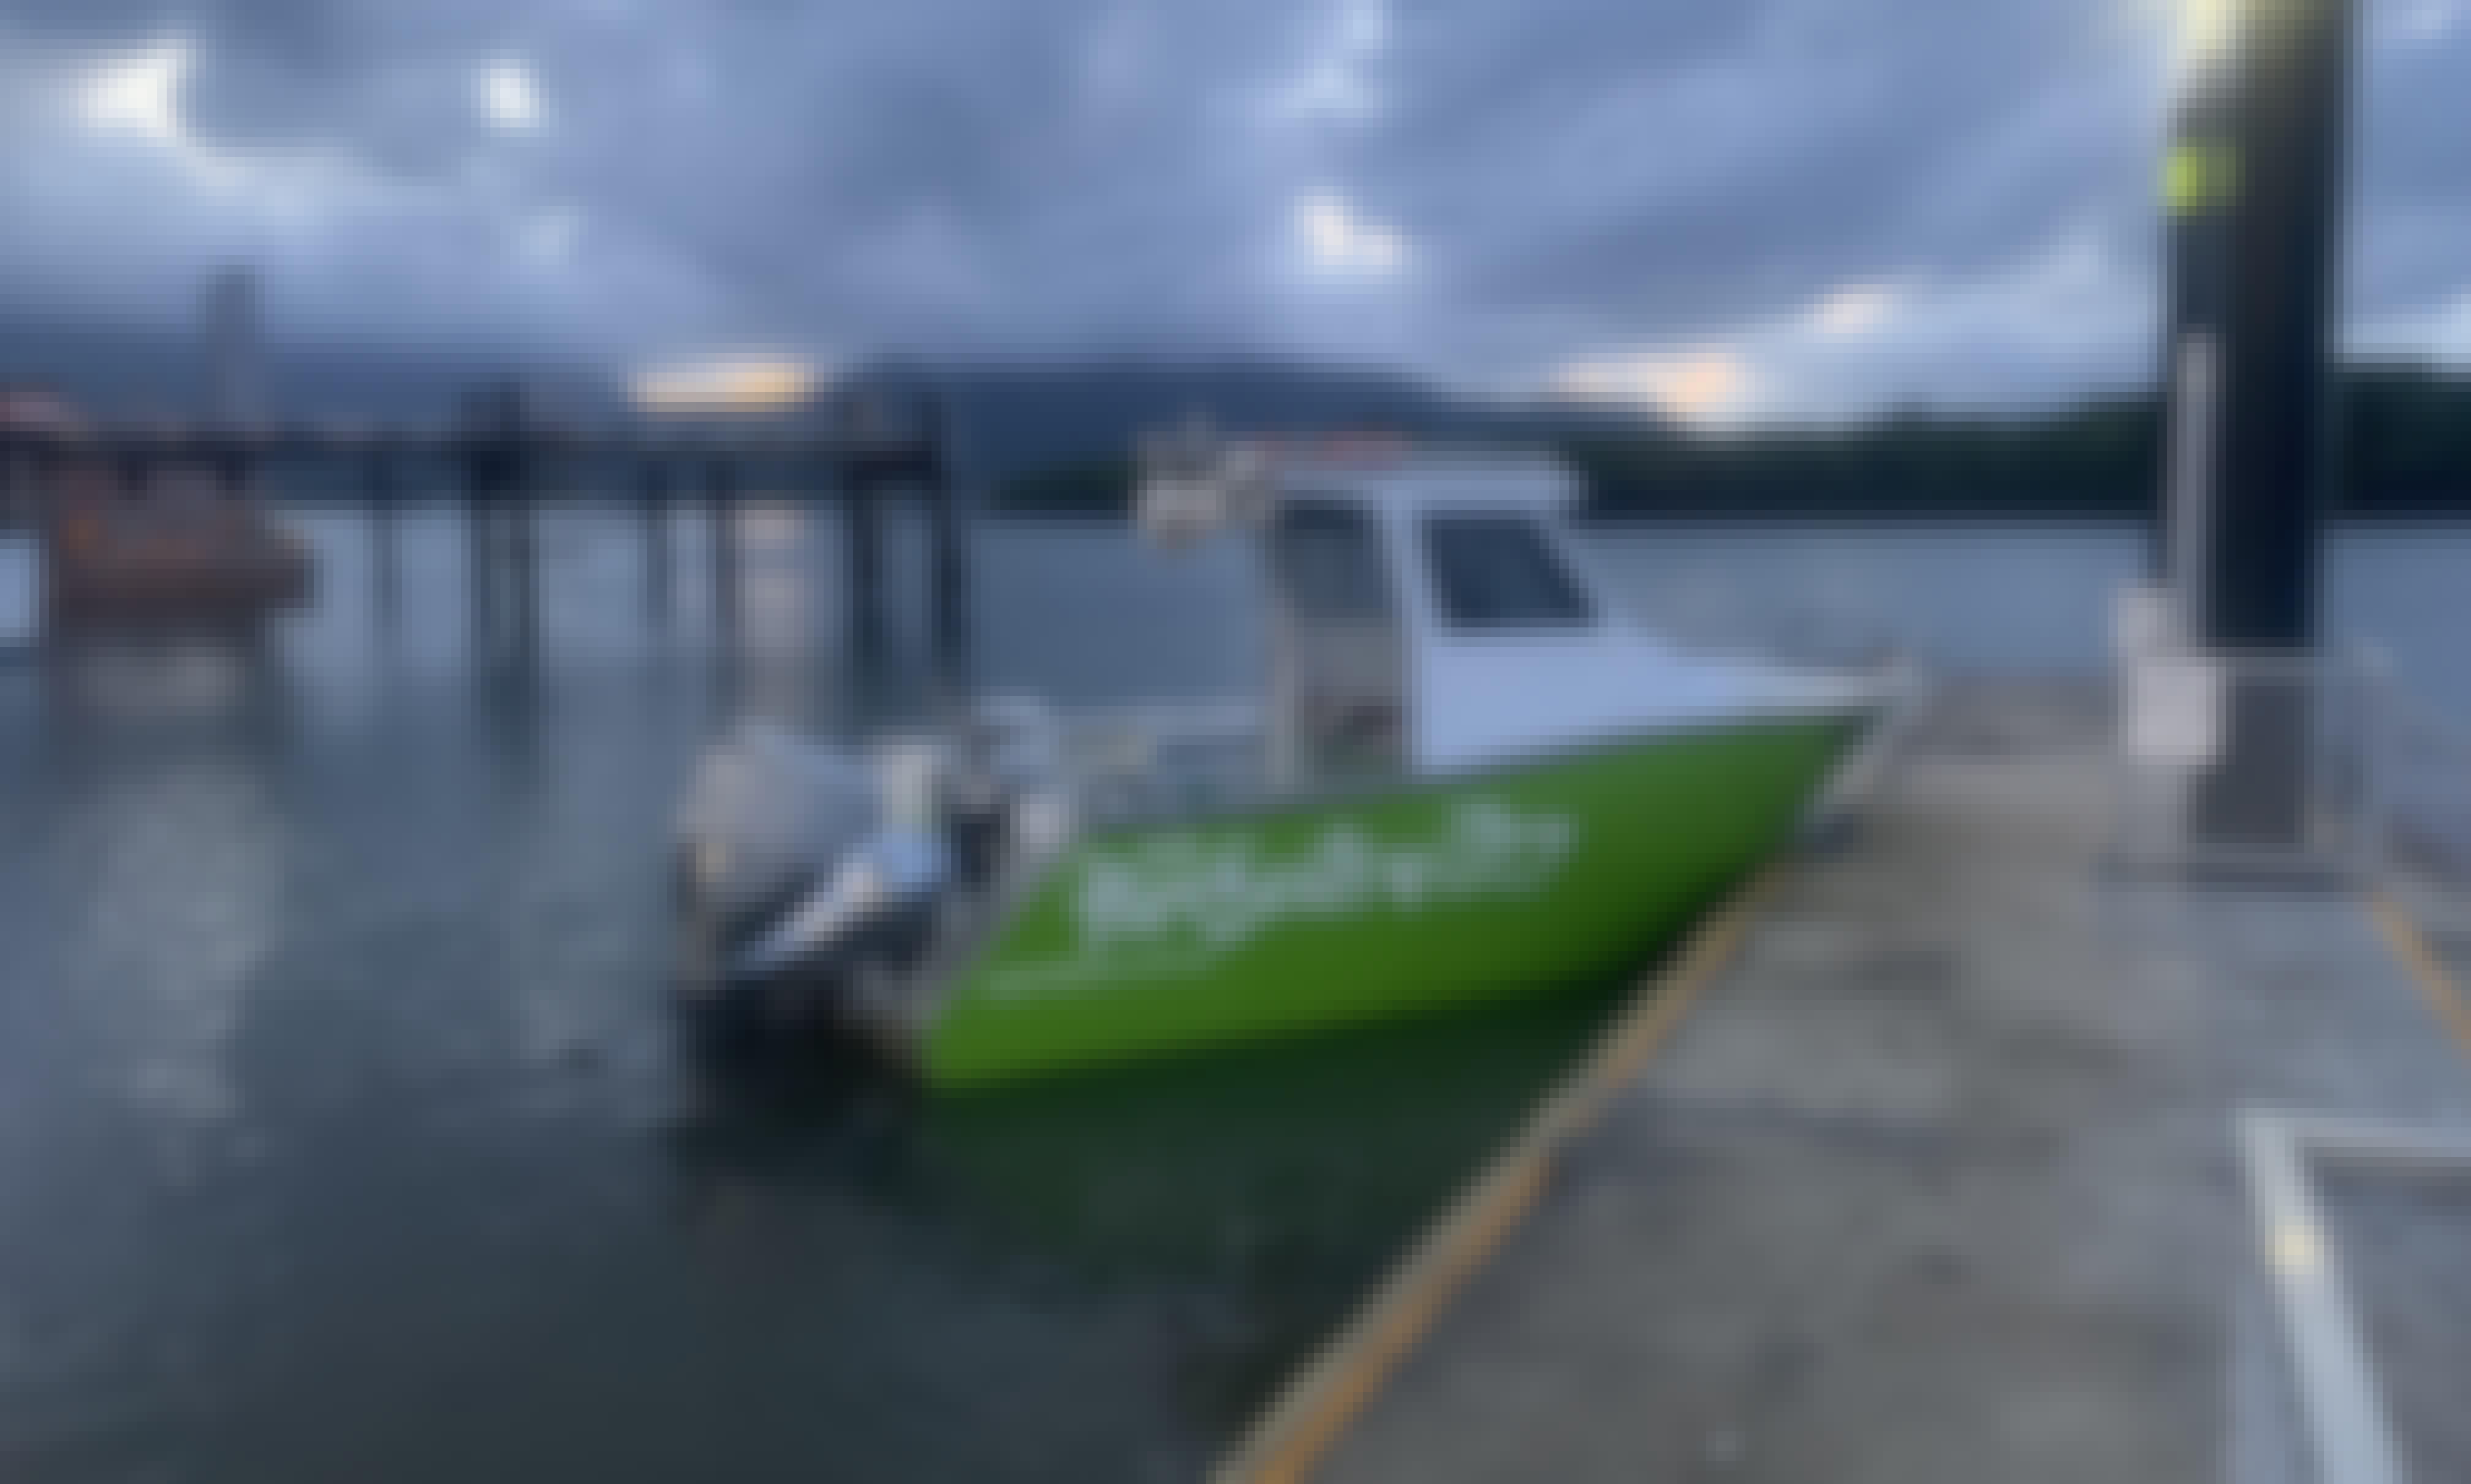 Rent this 7-Person Reef Boat in Port Douglas, Australia